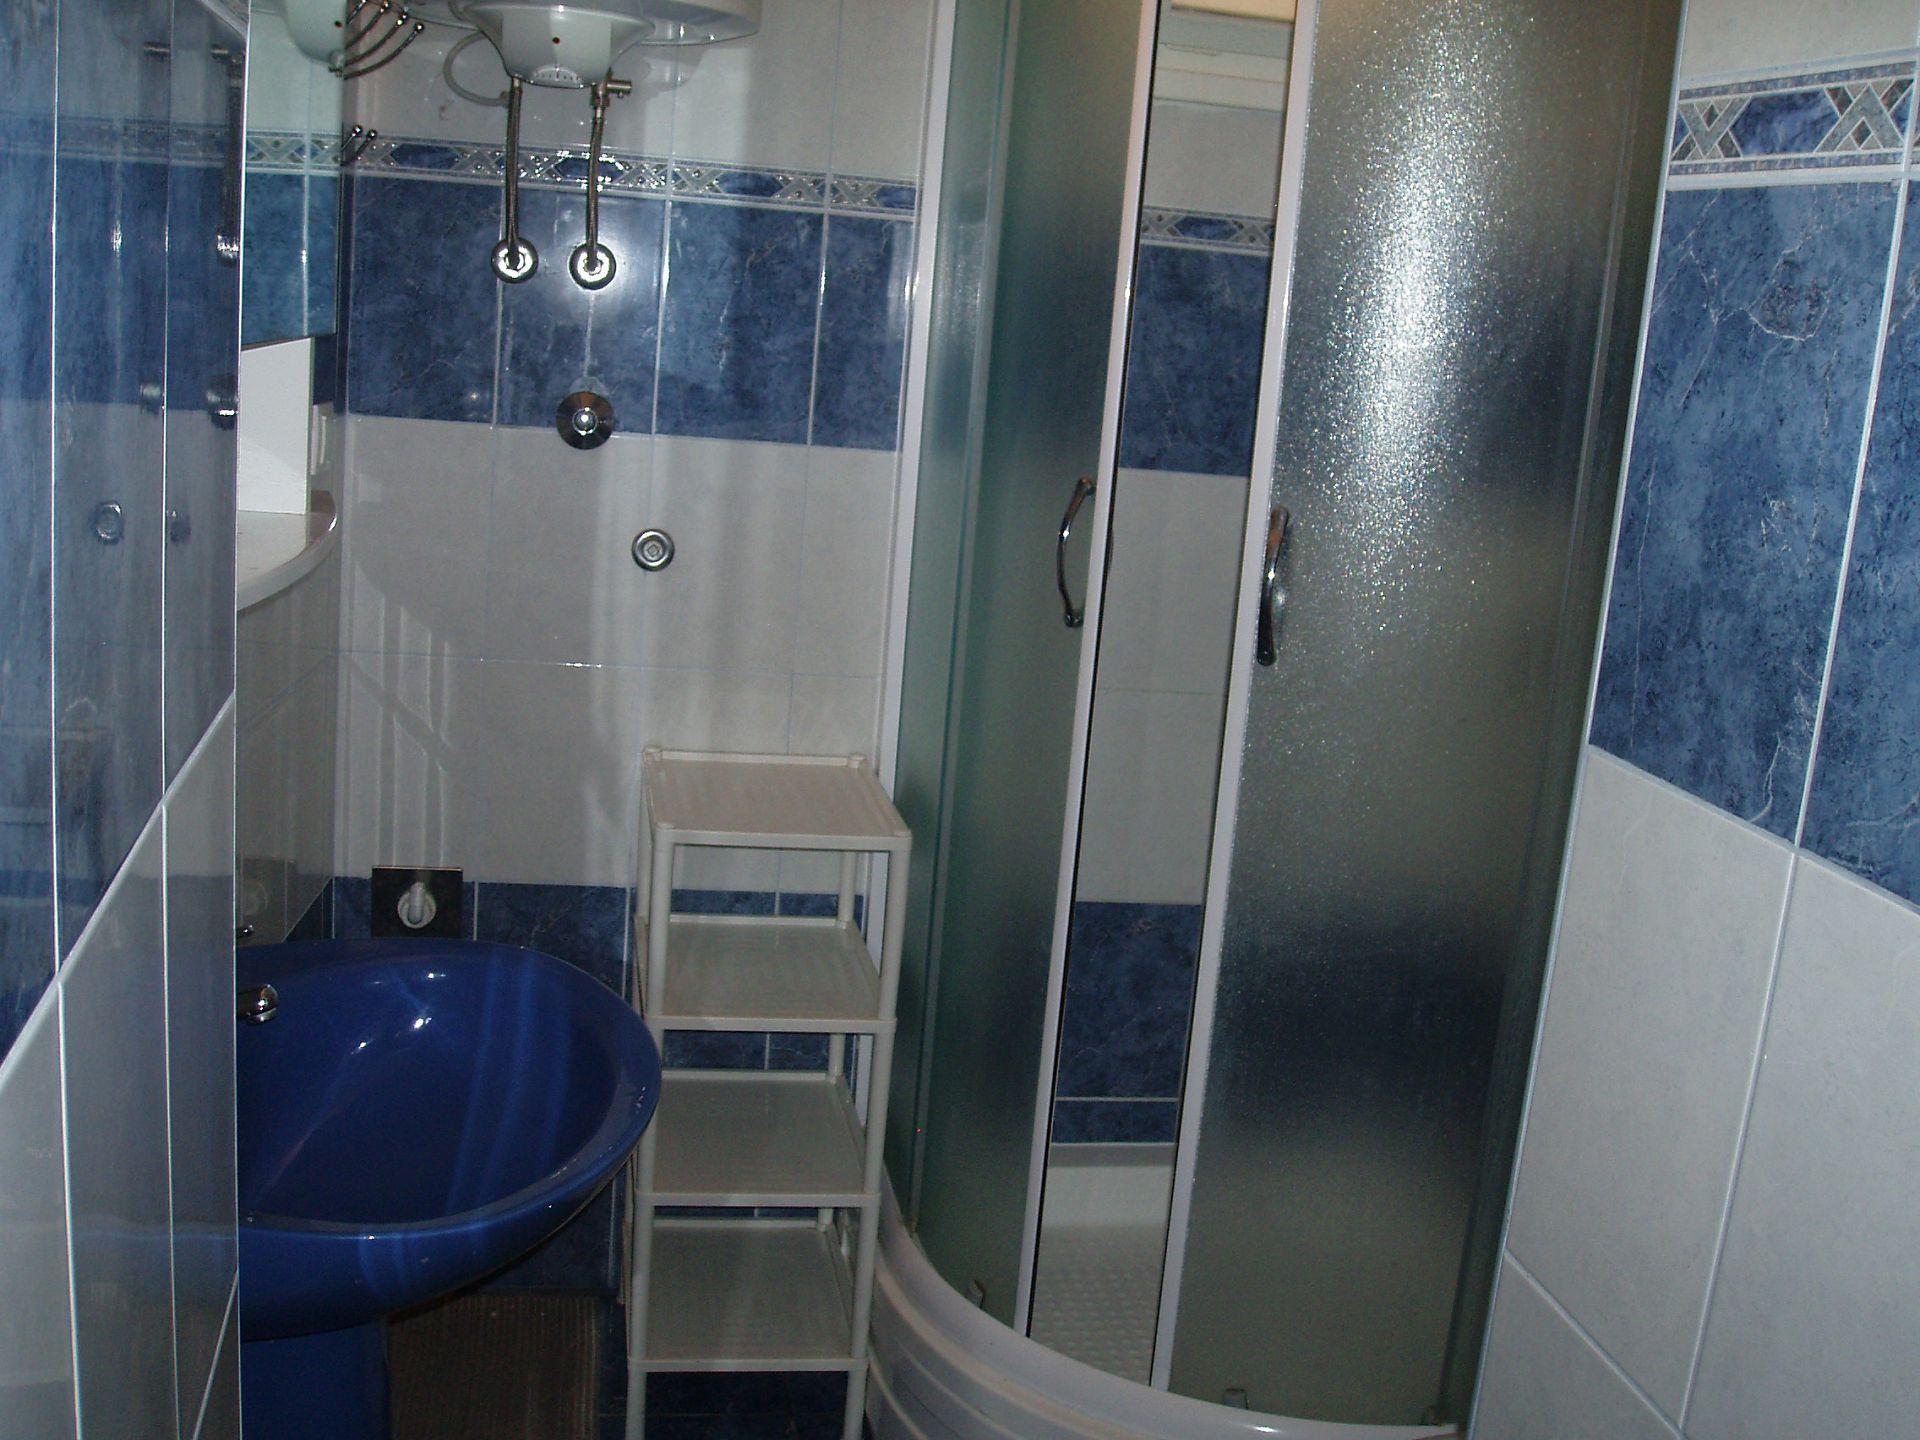 01501SUTI - Sutivan - Appartements Croatie - A1(6): salle de bain W-C